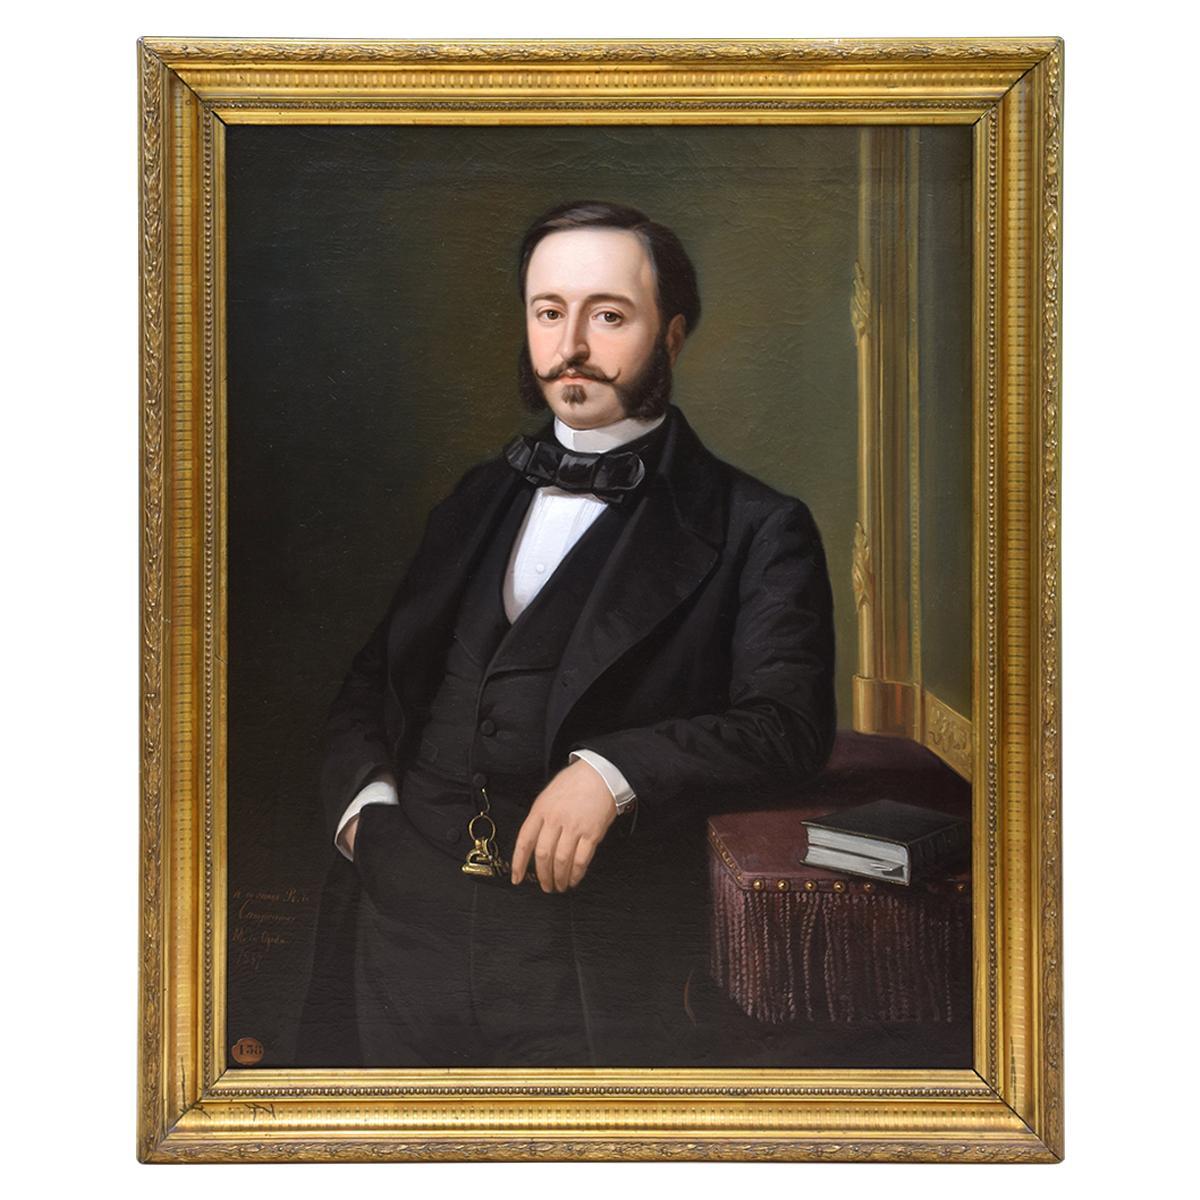 Ramón de Campoamor, Oil on Canvas, Signed, Ojeda Y Siles, Manuel, 1857